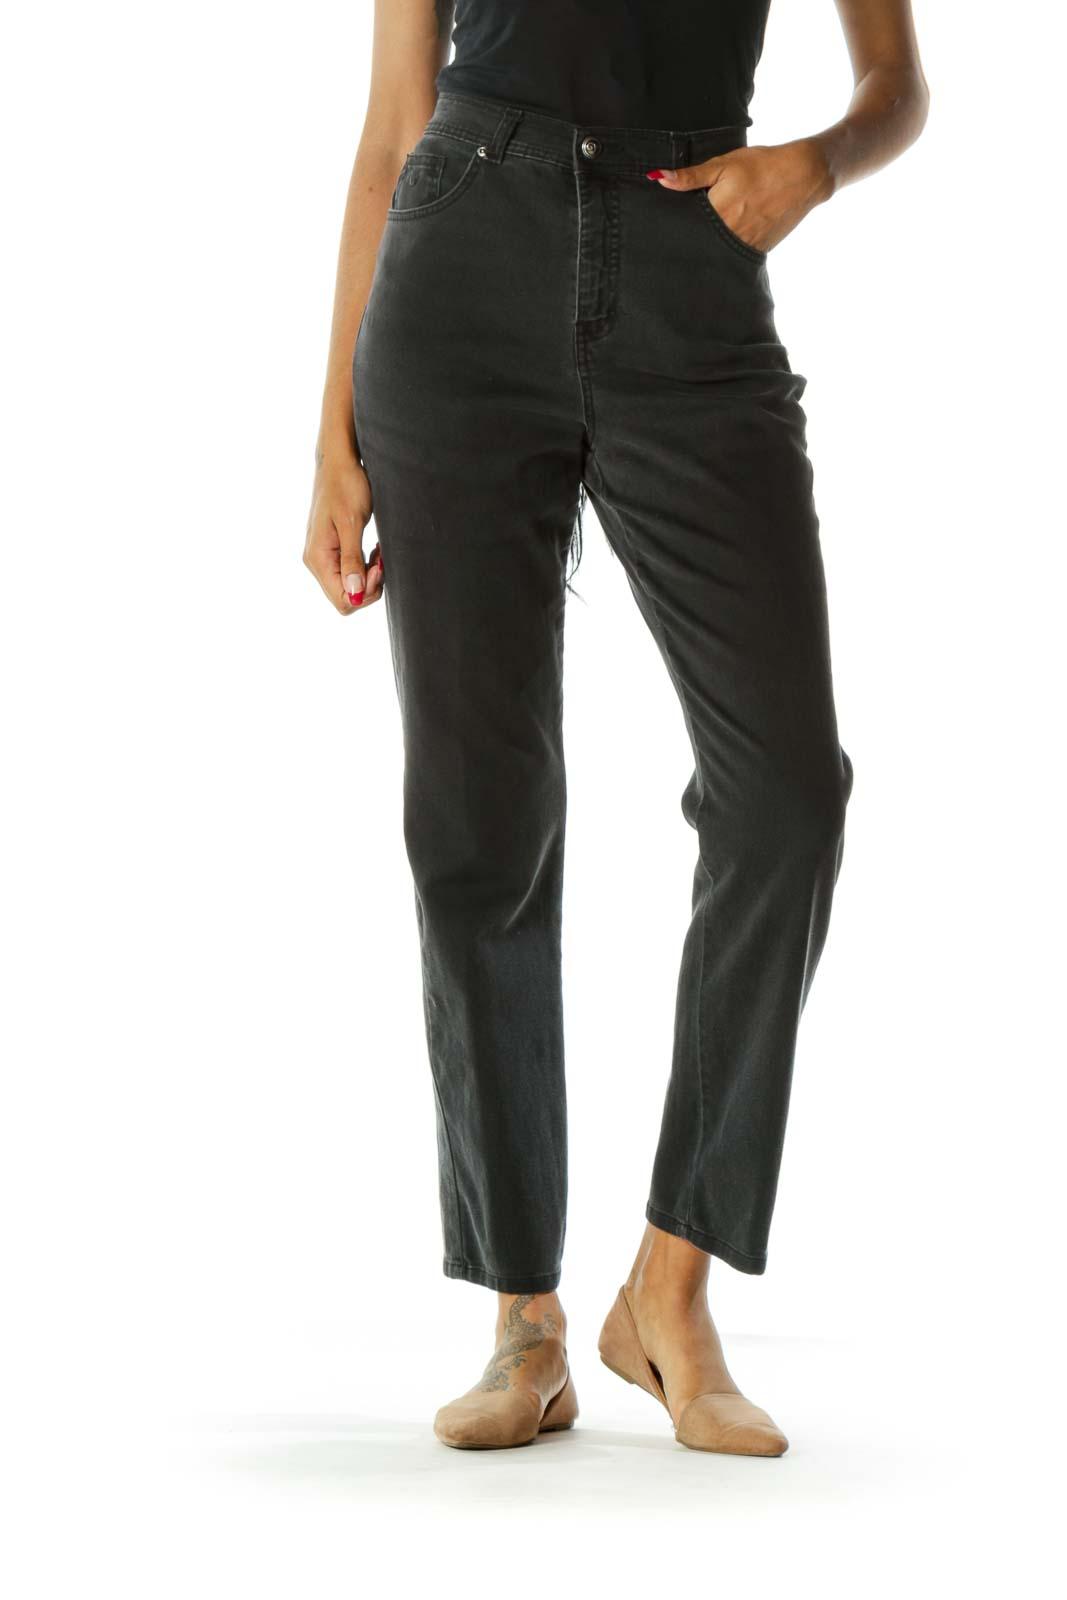 Black High-Waisted Denim Jeans Front